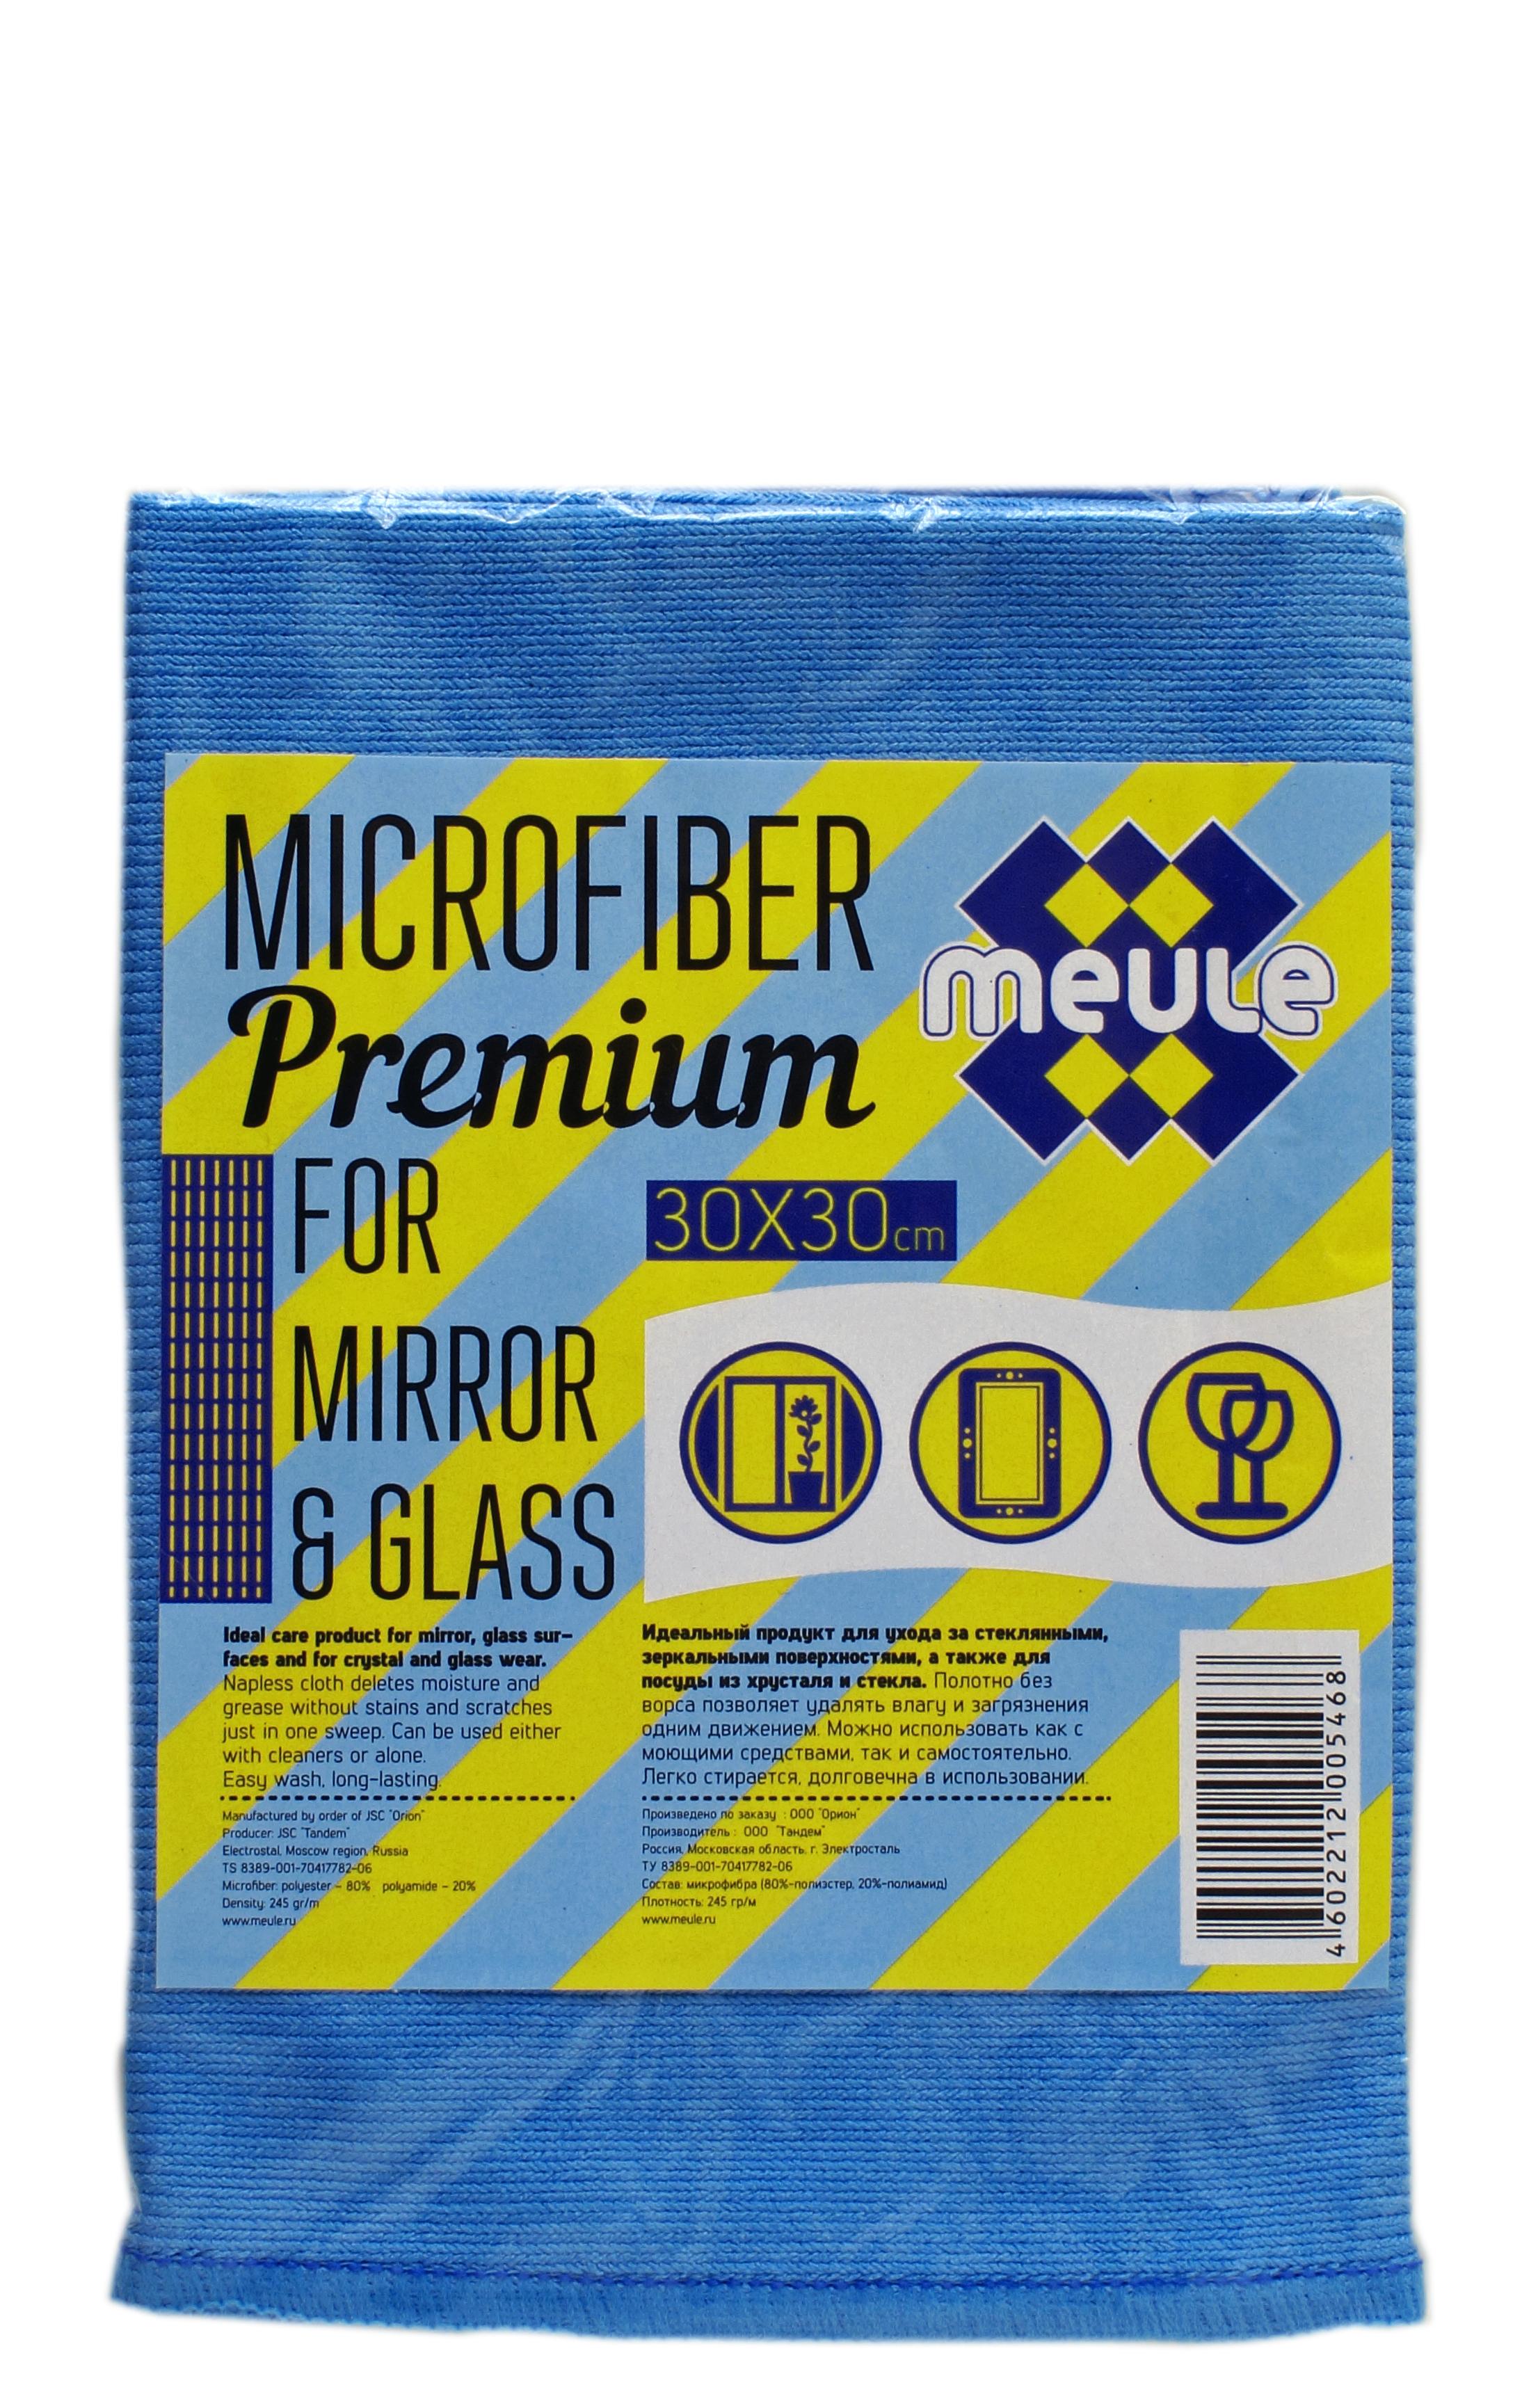 Салфетка Meule, для уборки стеклянных и зеркальных поверхностей, 30 х 30 см46070092411424602212005468 Meule 30x30cm. 260гр./м MICROFIBER. (PREMIUM FOR MIRROR@GLASS 30x30) Салфетка из микрофибры для уборки стеклянных и зеркальных поверхностей 1/40